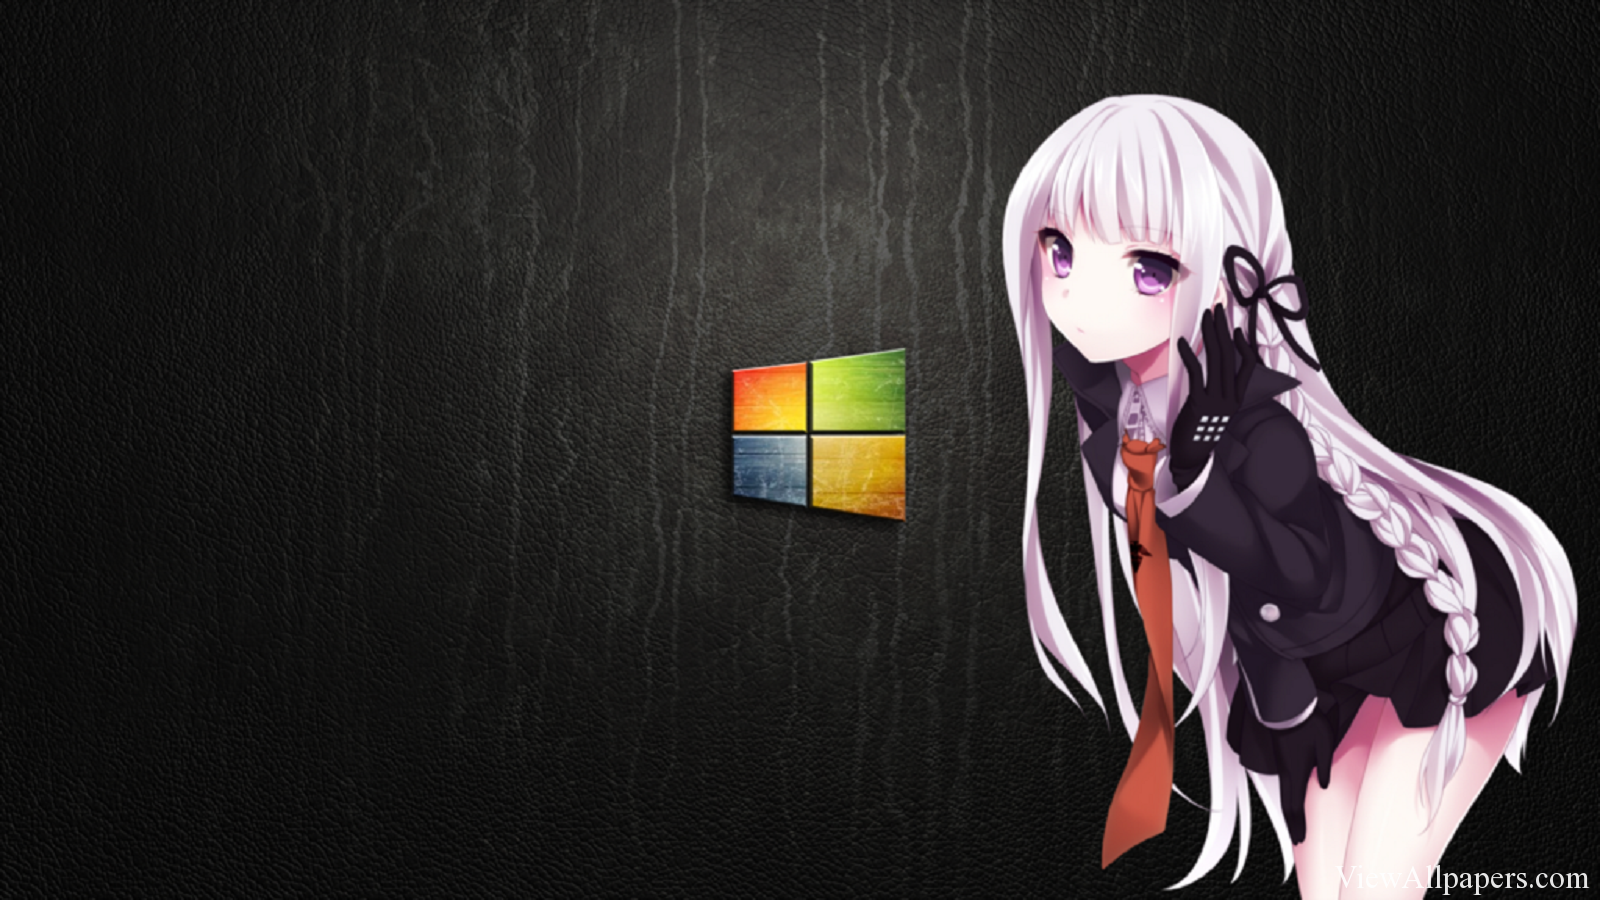 Anime girl wallpaper windows 10 wallpapersafari - Anime wallpaper 1360x768 hd ...